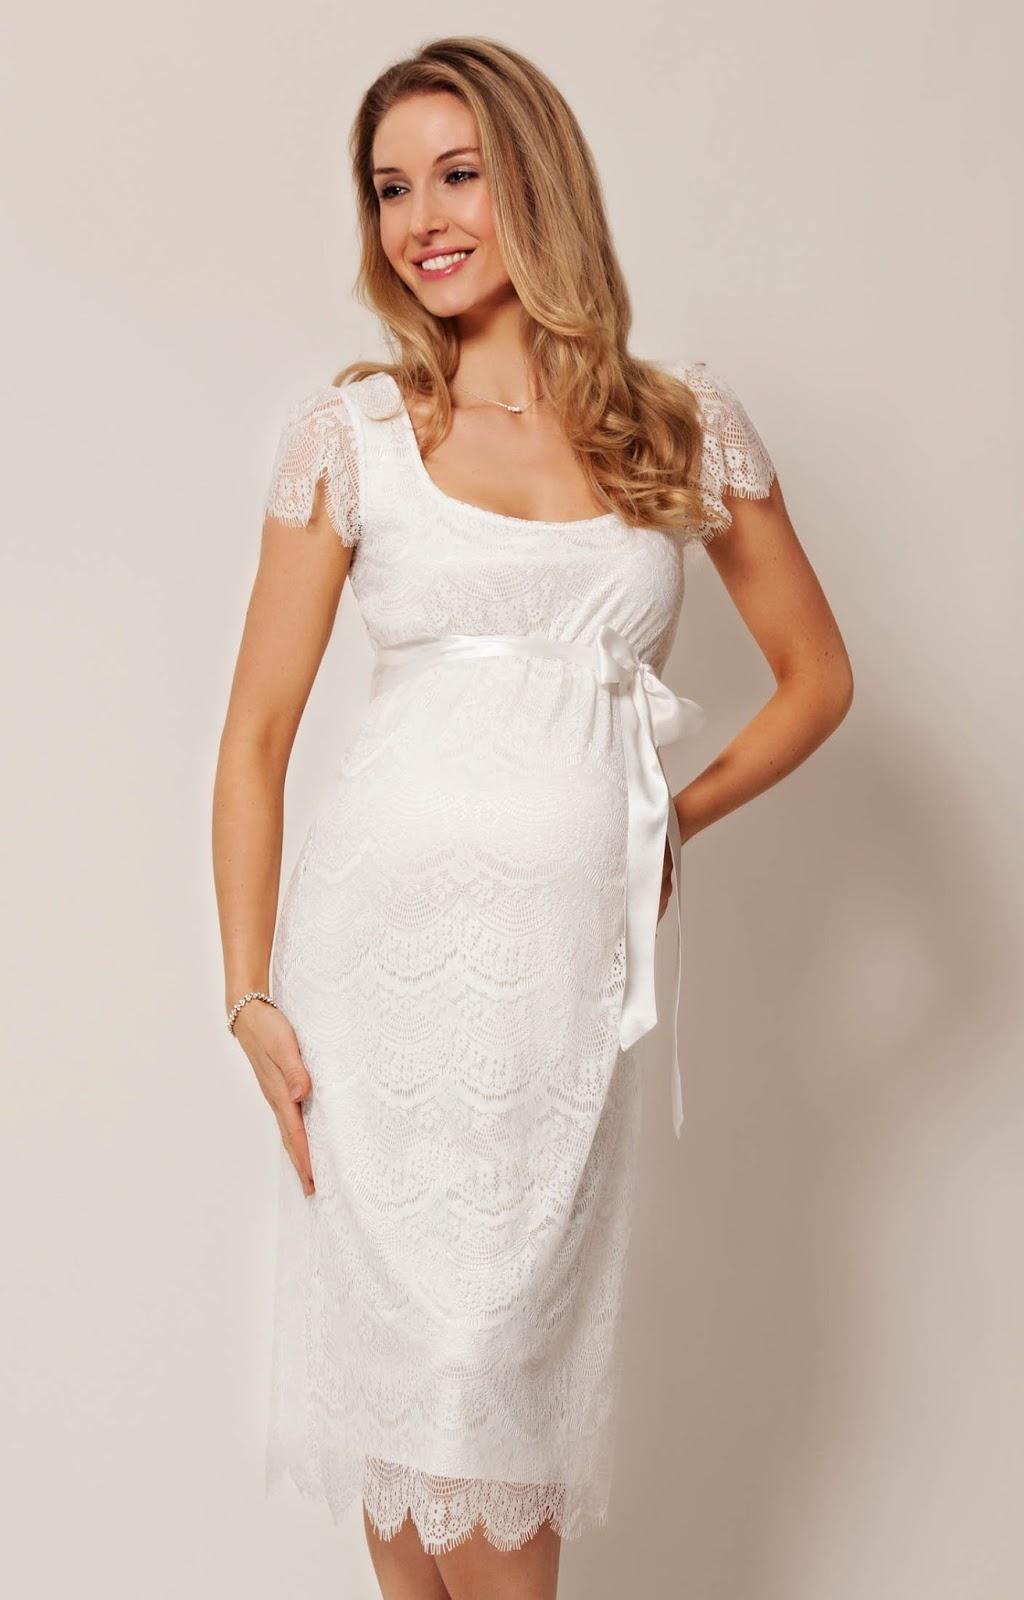 wedding dresses cold climates: Wedding Dresses for Pregnant Women